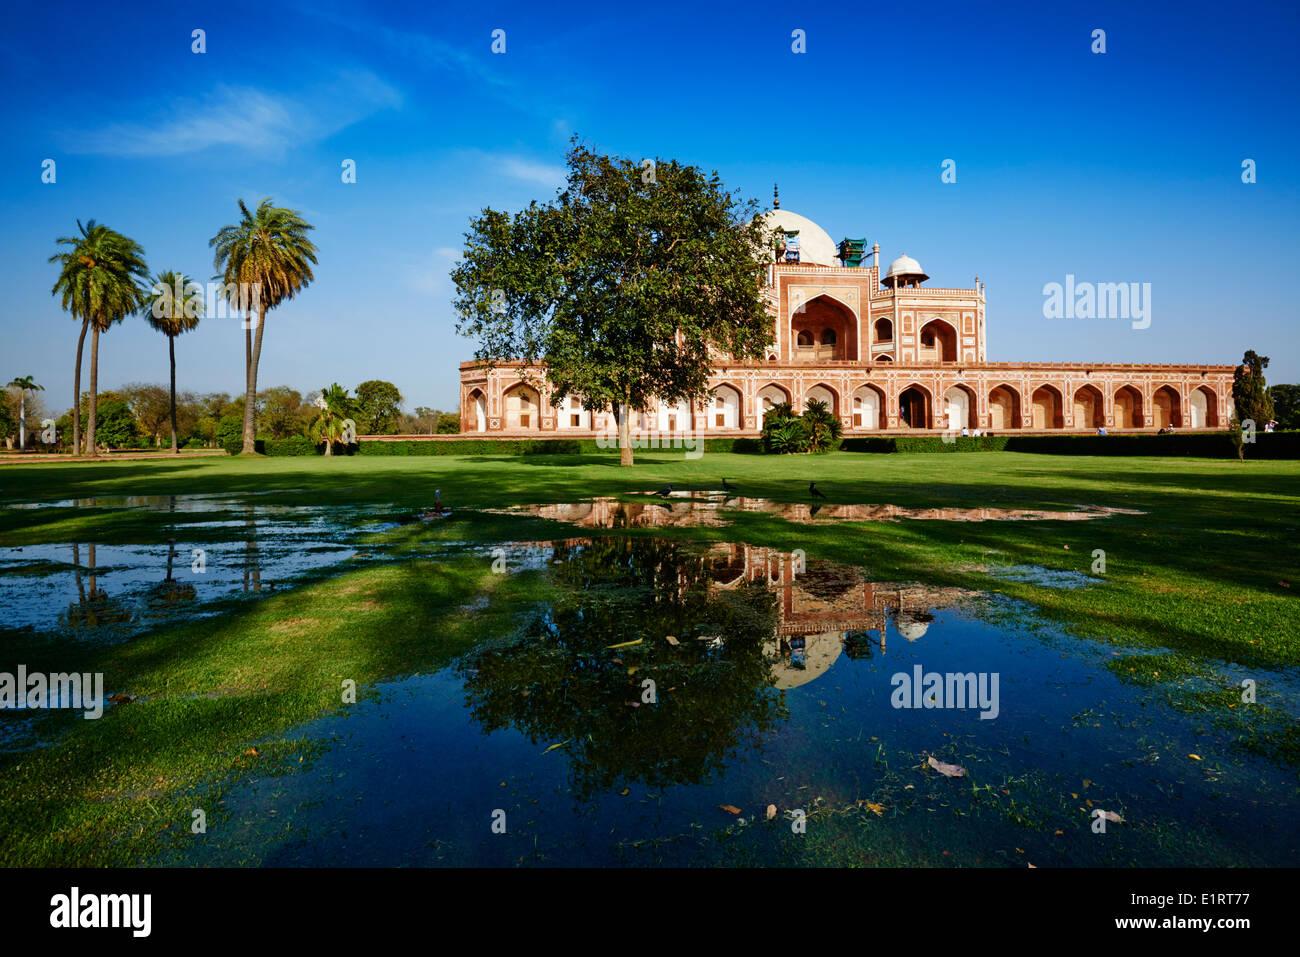 Indien, Delhi, Humayun-Mausoleum, UNESCO-Welterbe Stockfoto